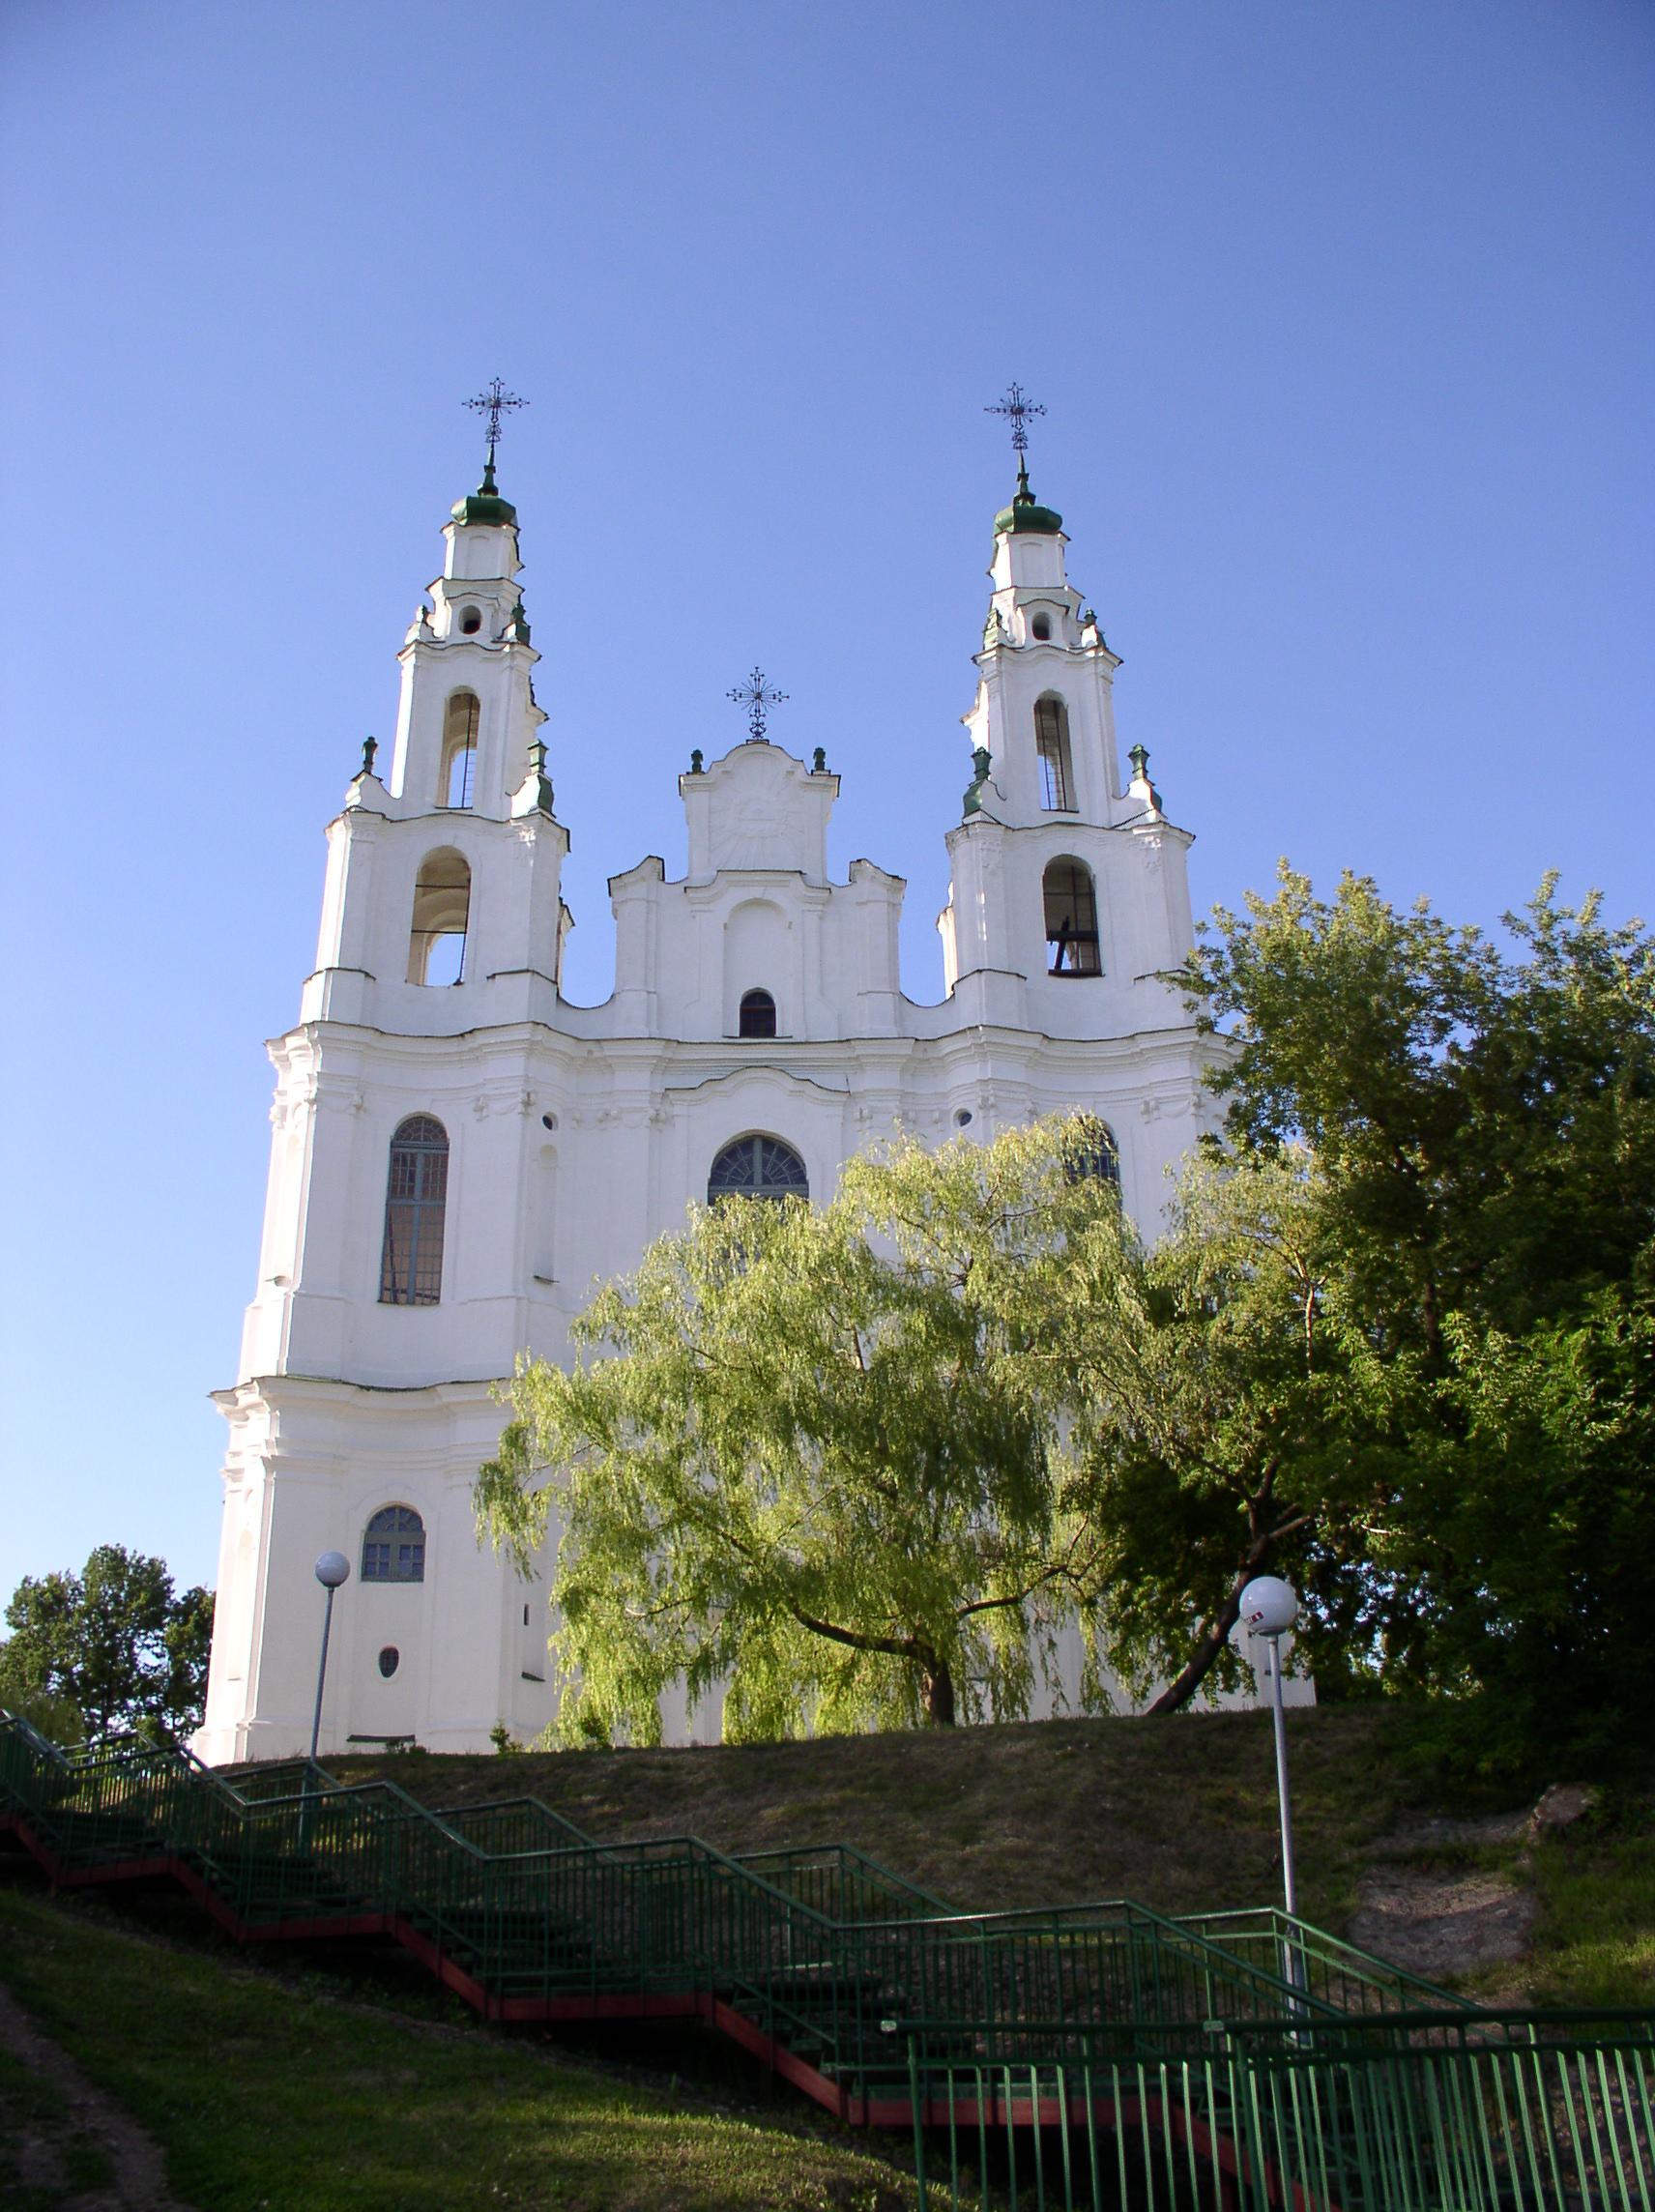 belarus - photo #39